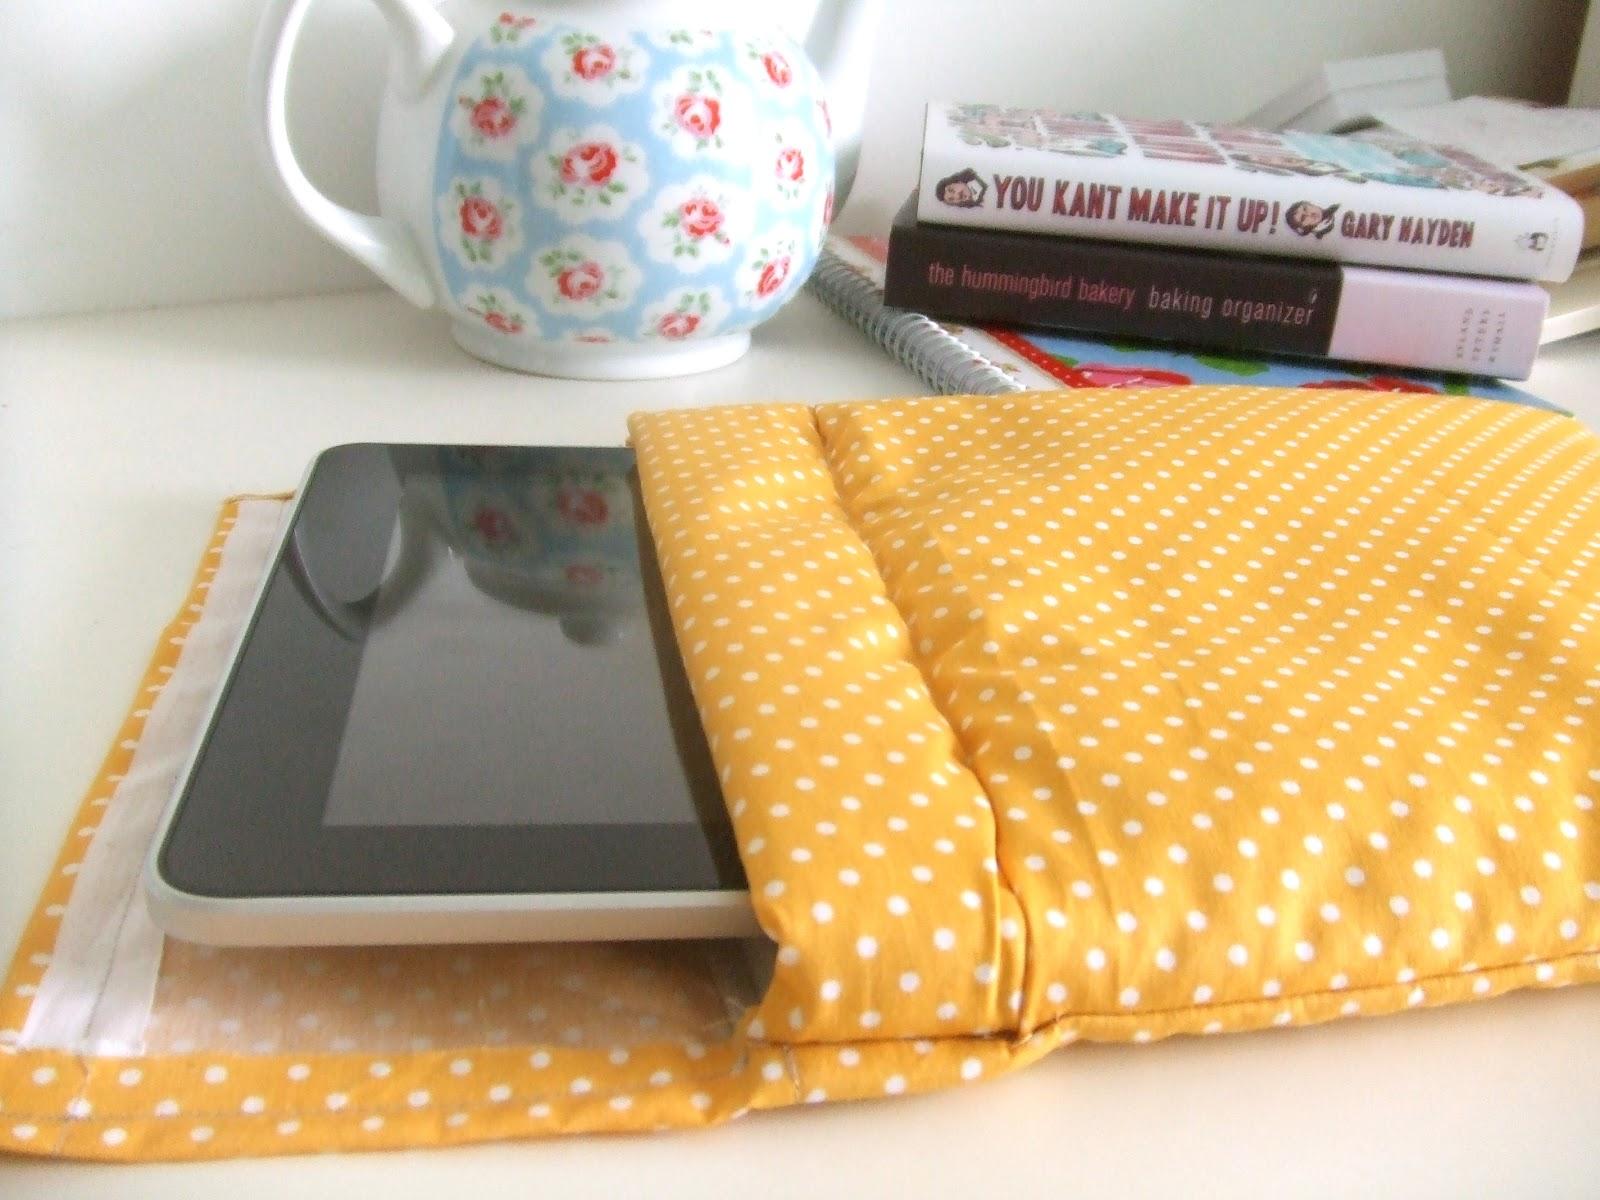 Trends With Benefits: DIY Ipad Case